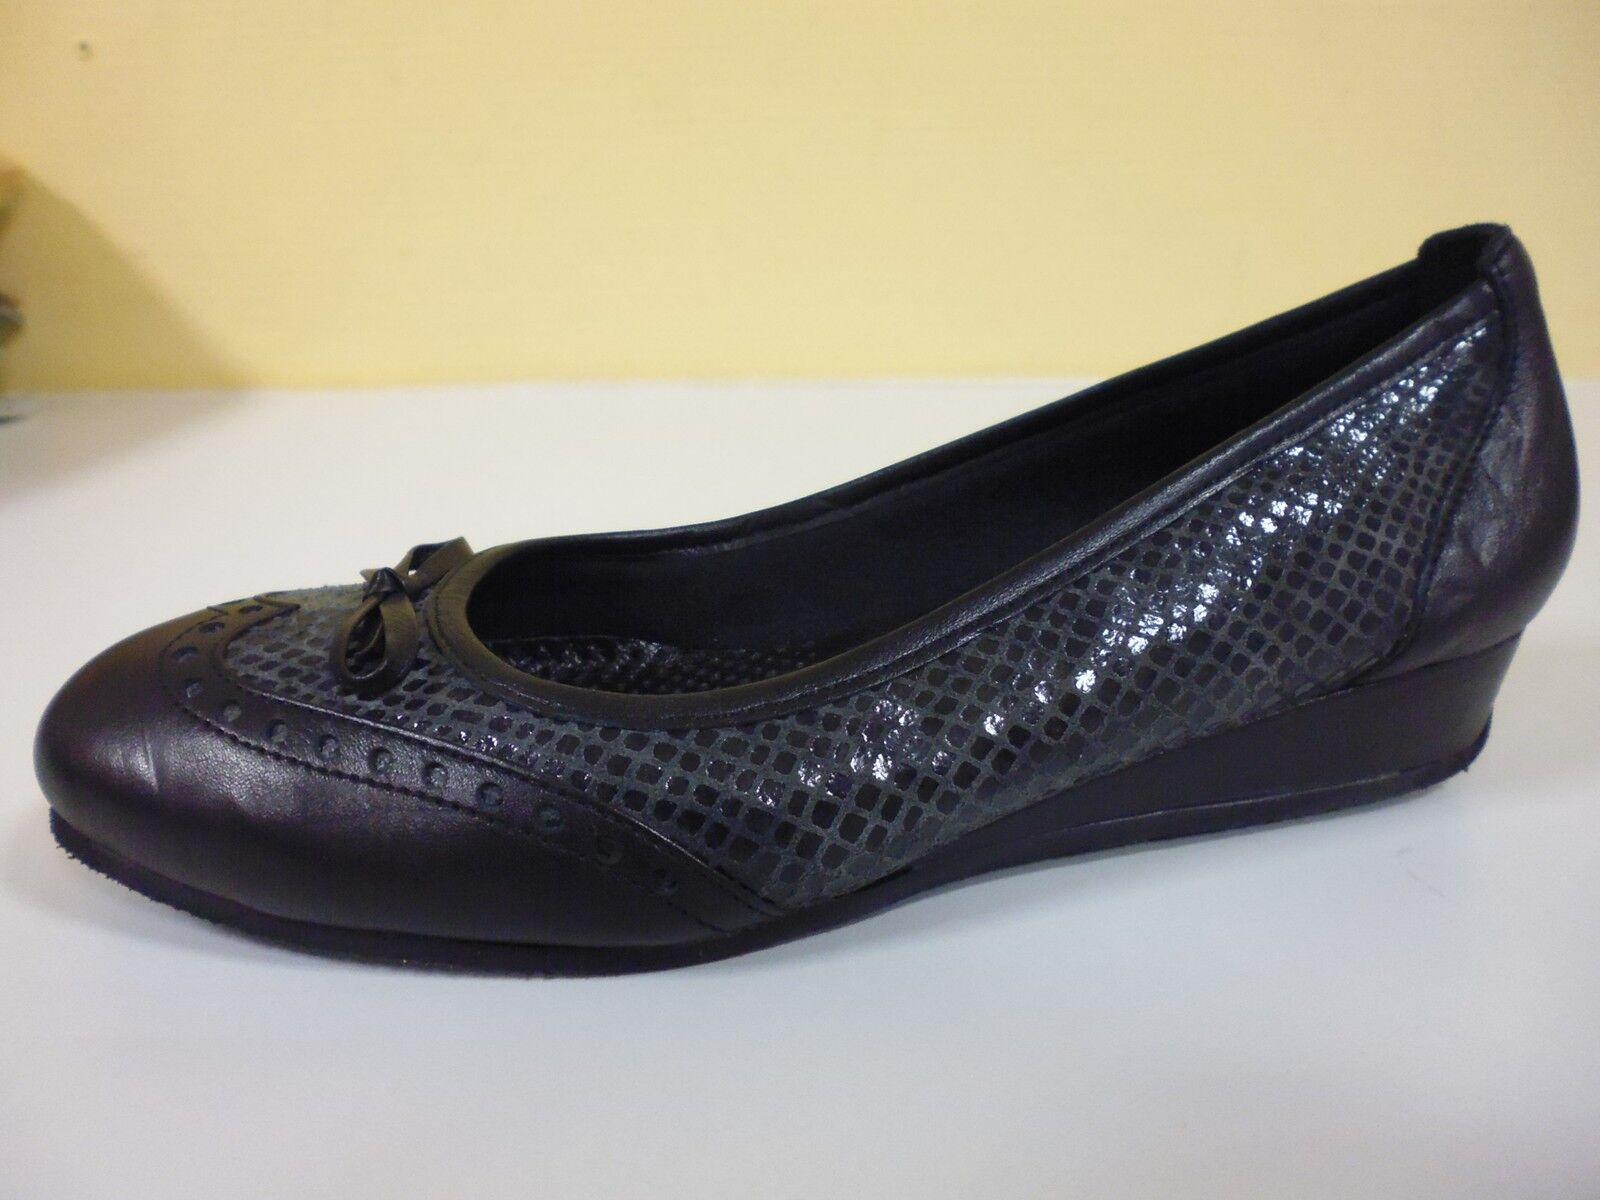 Chaussures Pantoufles Ballerines Sandale cuir Lady GRACIA taille 41 (7,5) W G